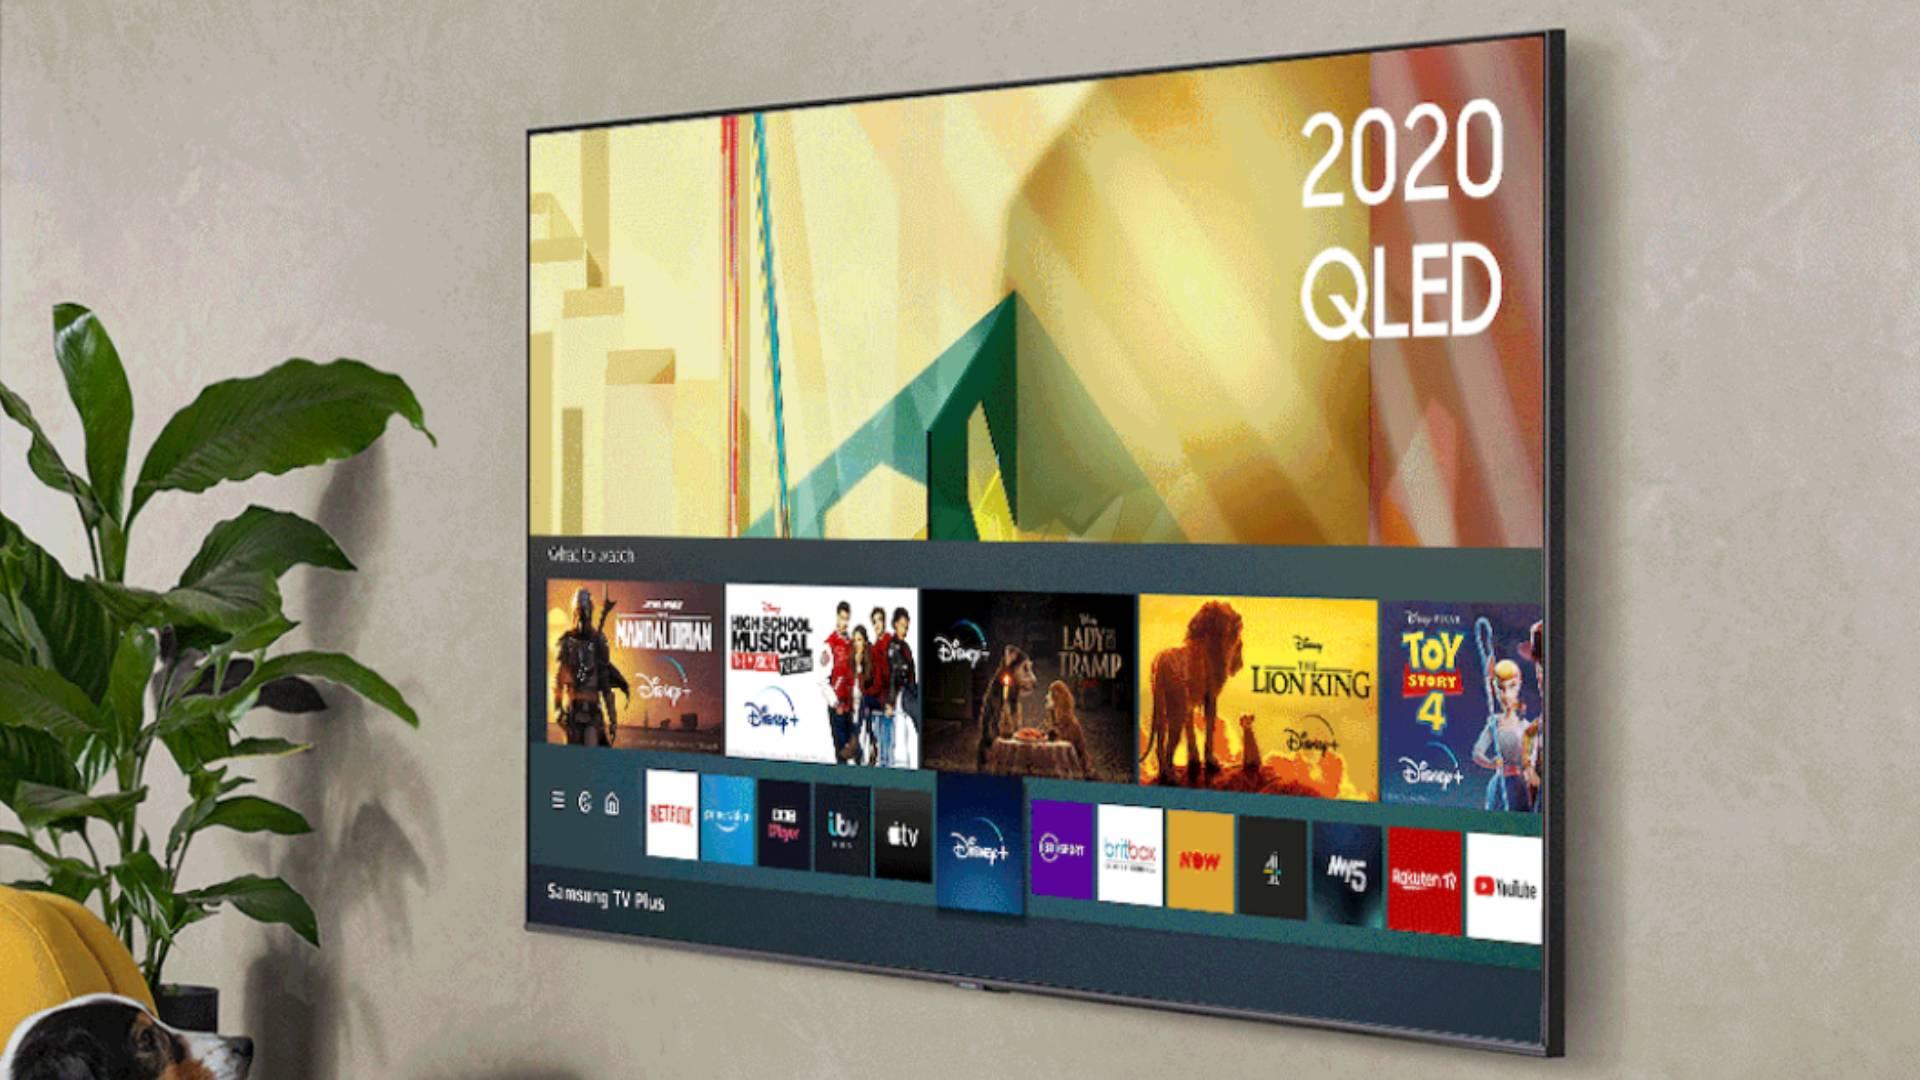 Samsung Tv Plus The Free Tv Streaming Service Explained Techradar